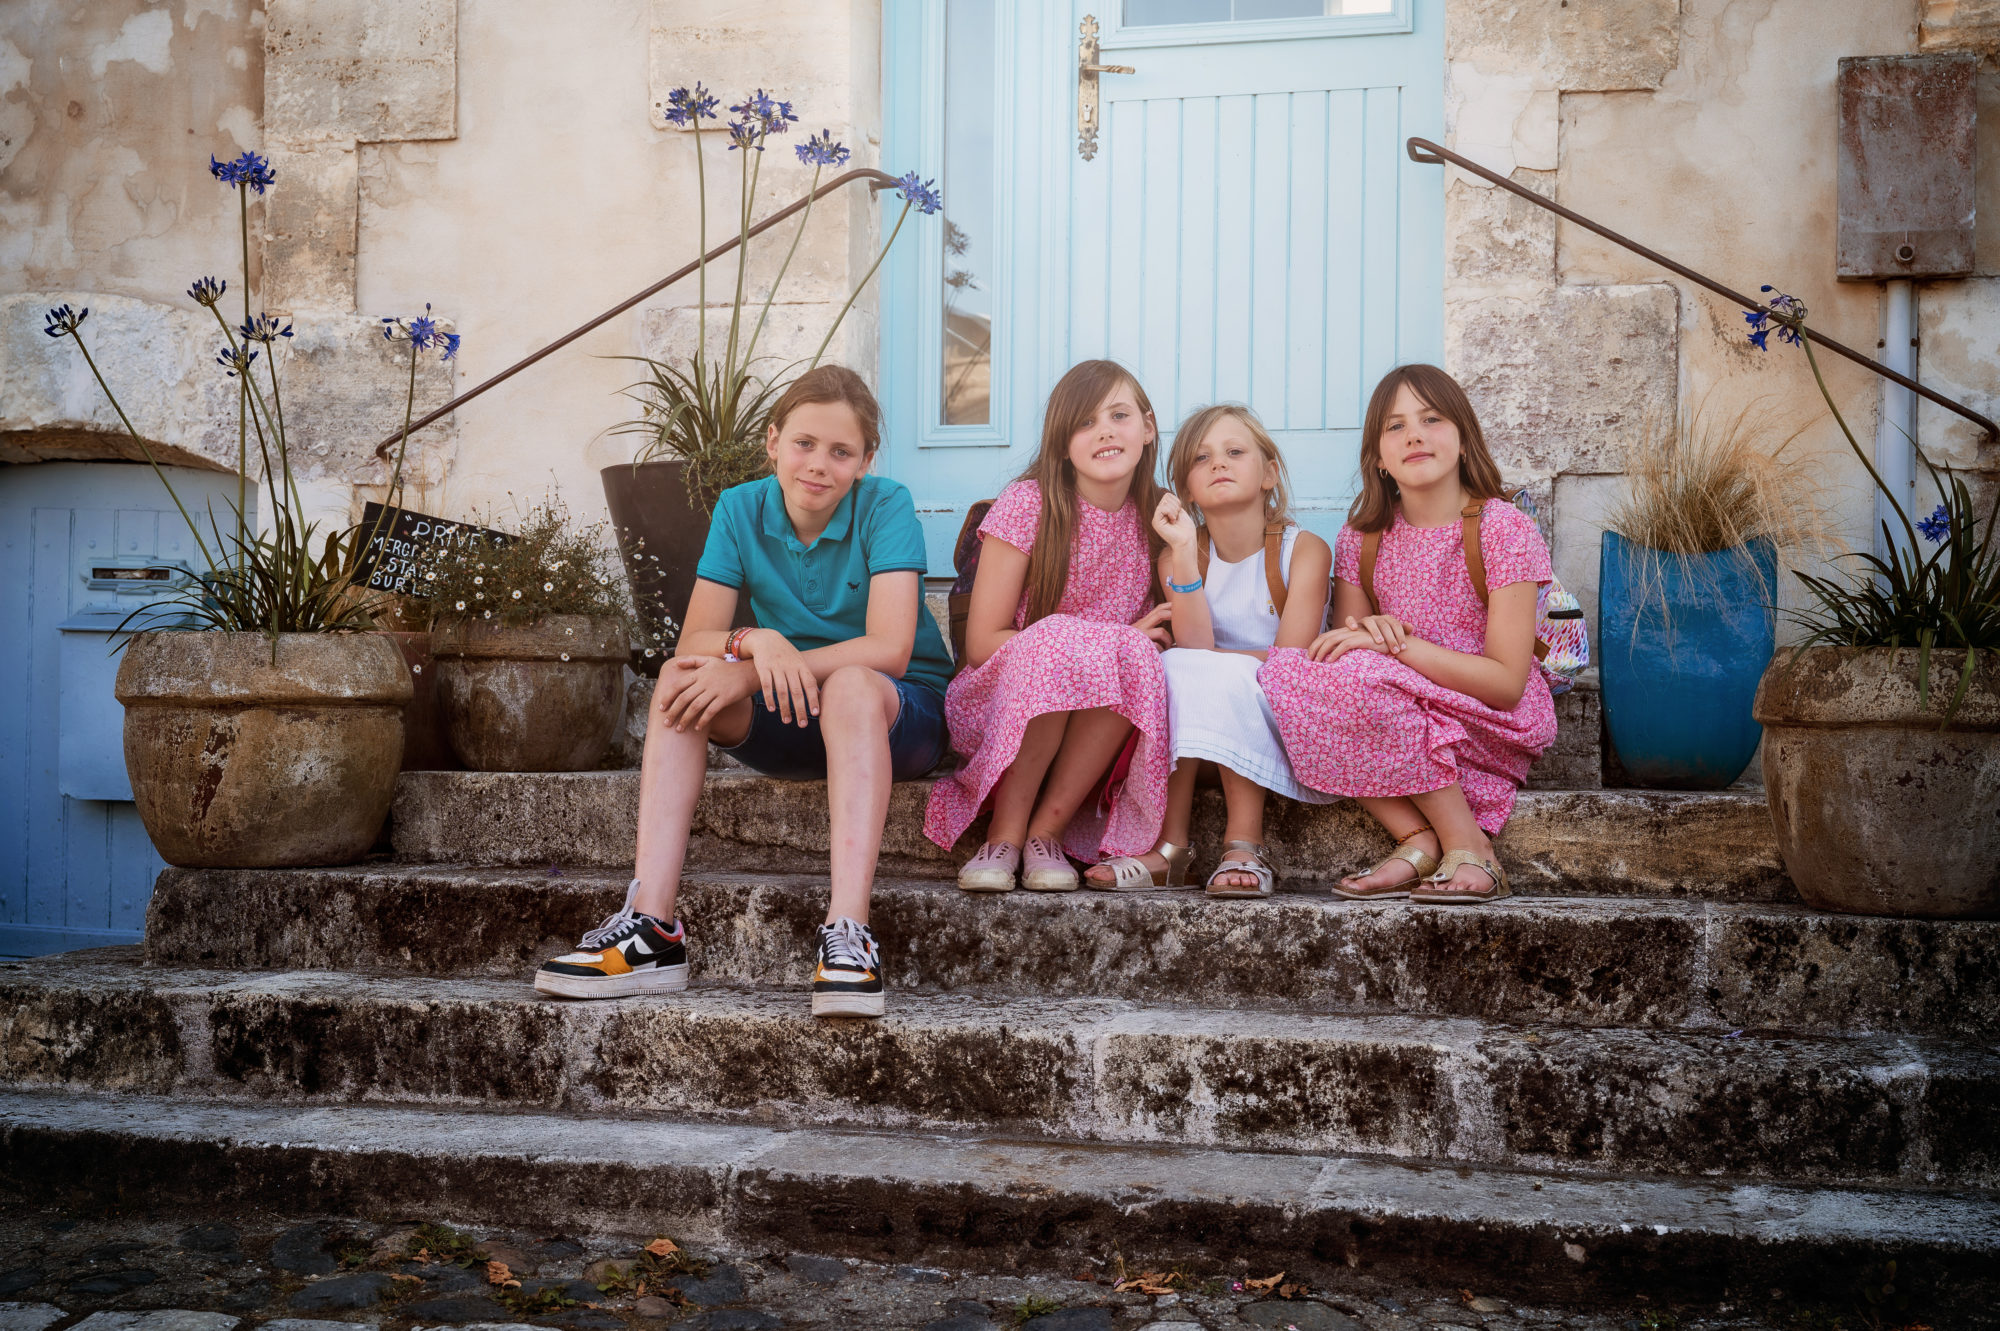 Balade dans les petites rues de Mornac-Sur-Seudre